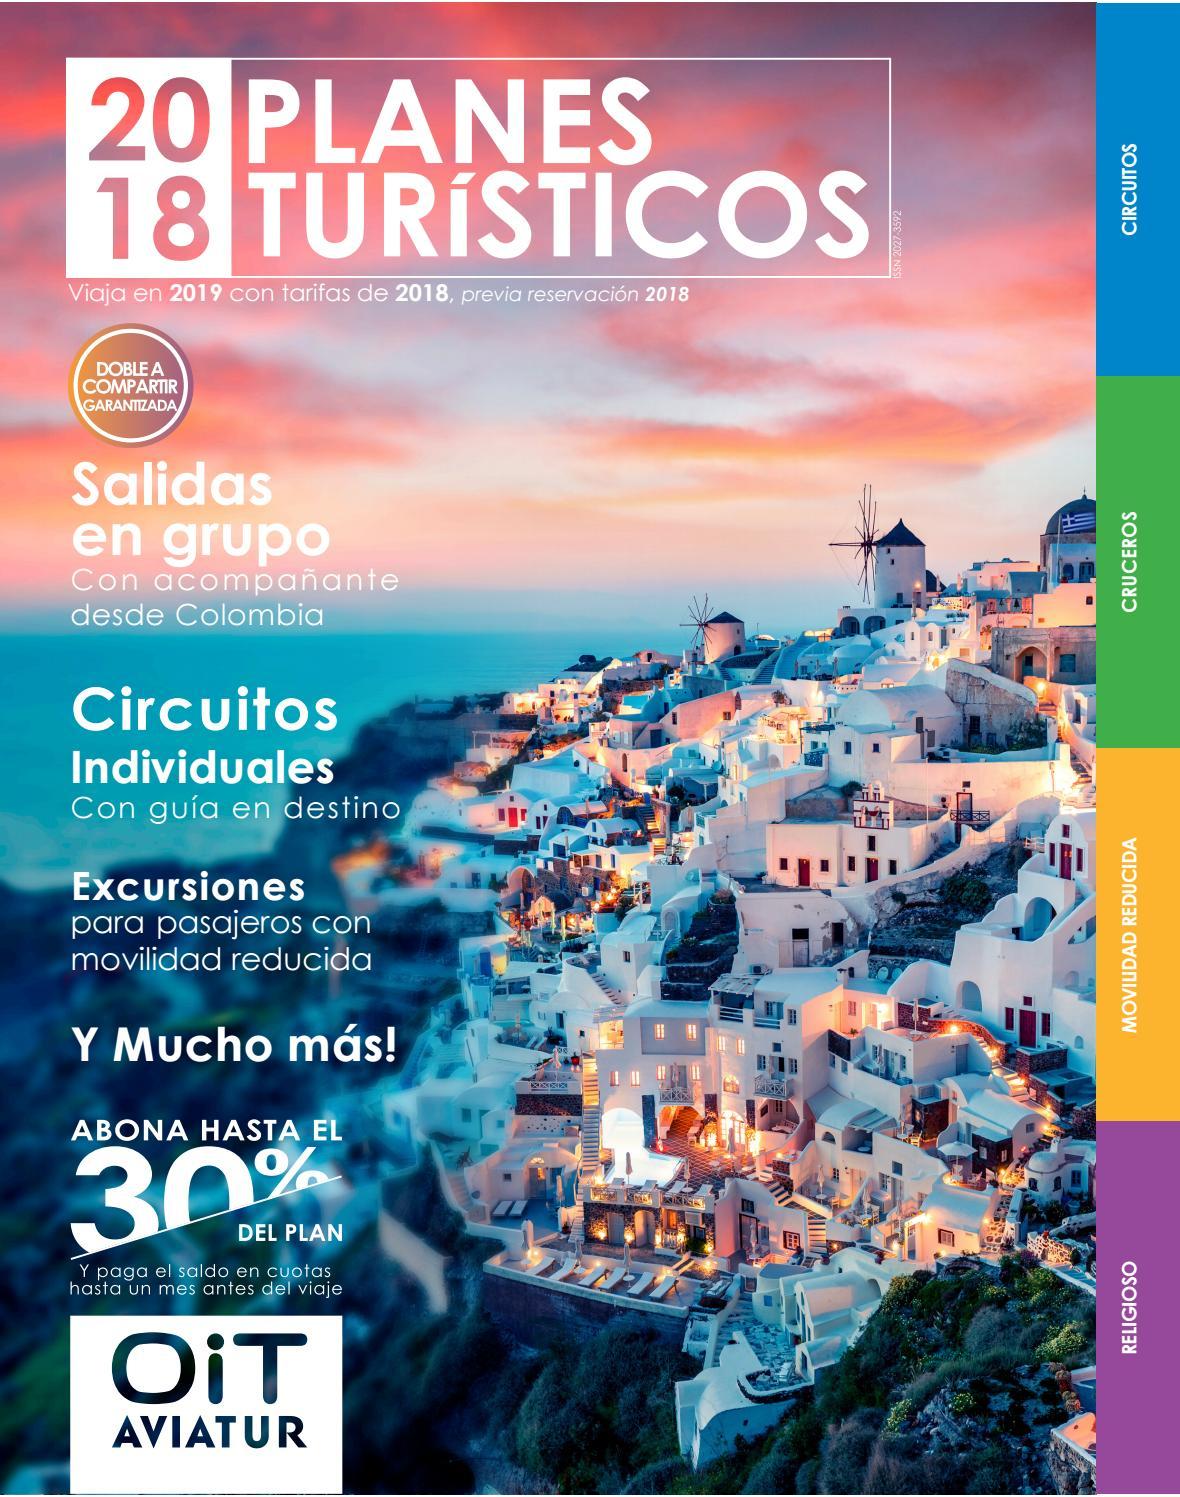 85babe07bc Planes Turísticos OIT 2018 by Agencia OIT - issuu